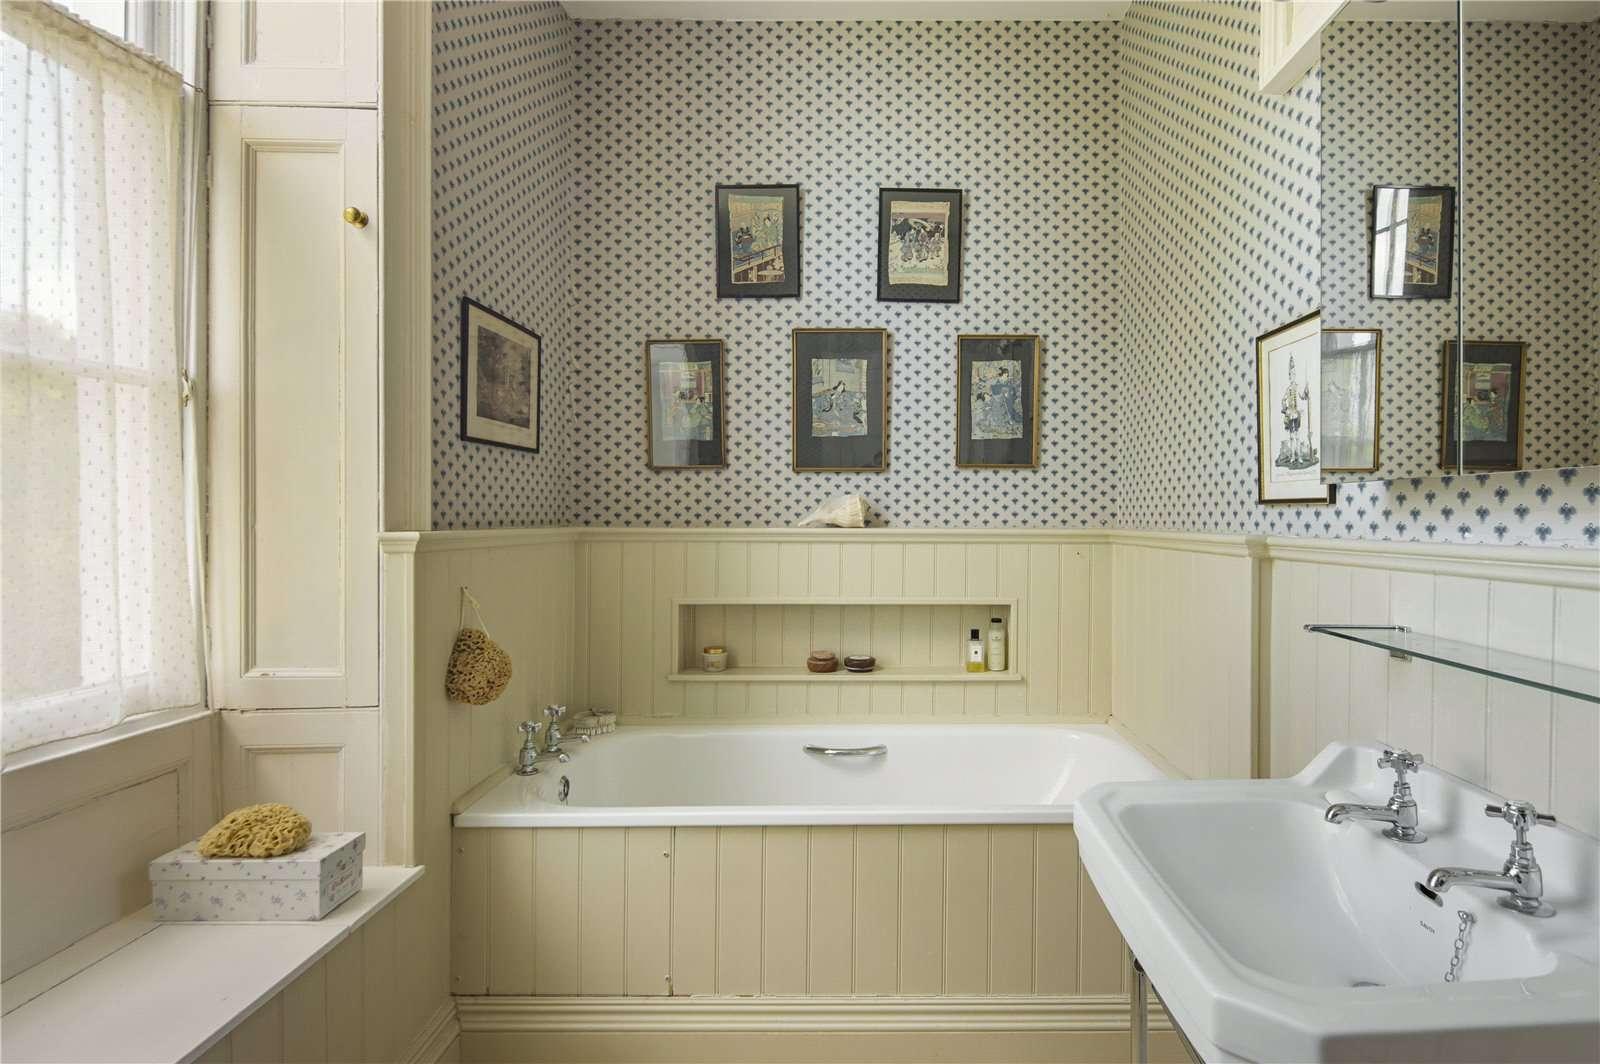 Beauforest House, Wallingford - Image Gallery 13 - Bathroom